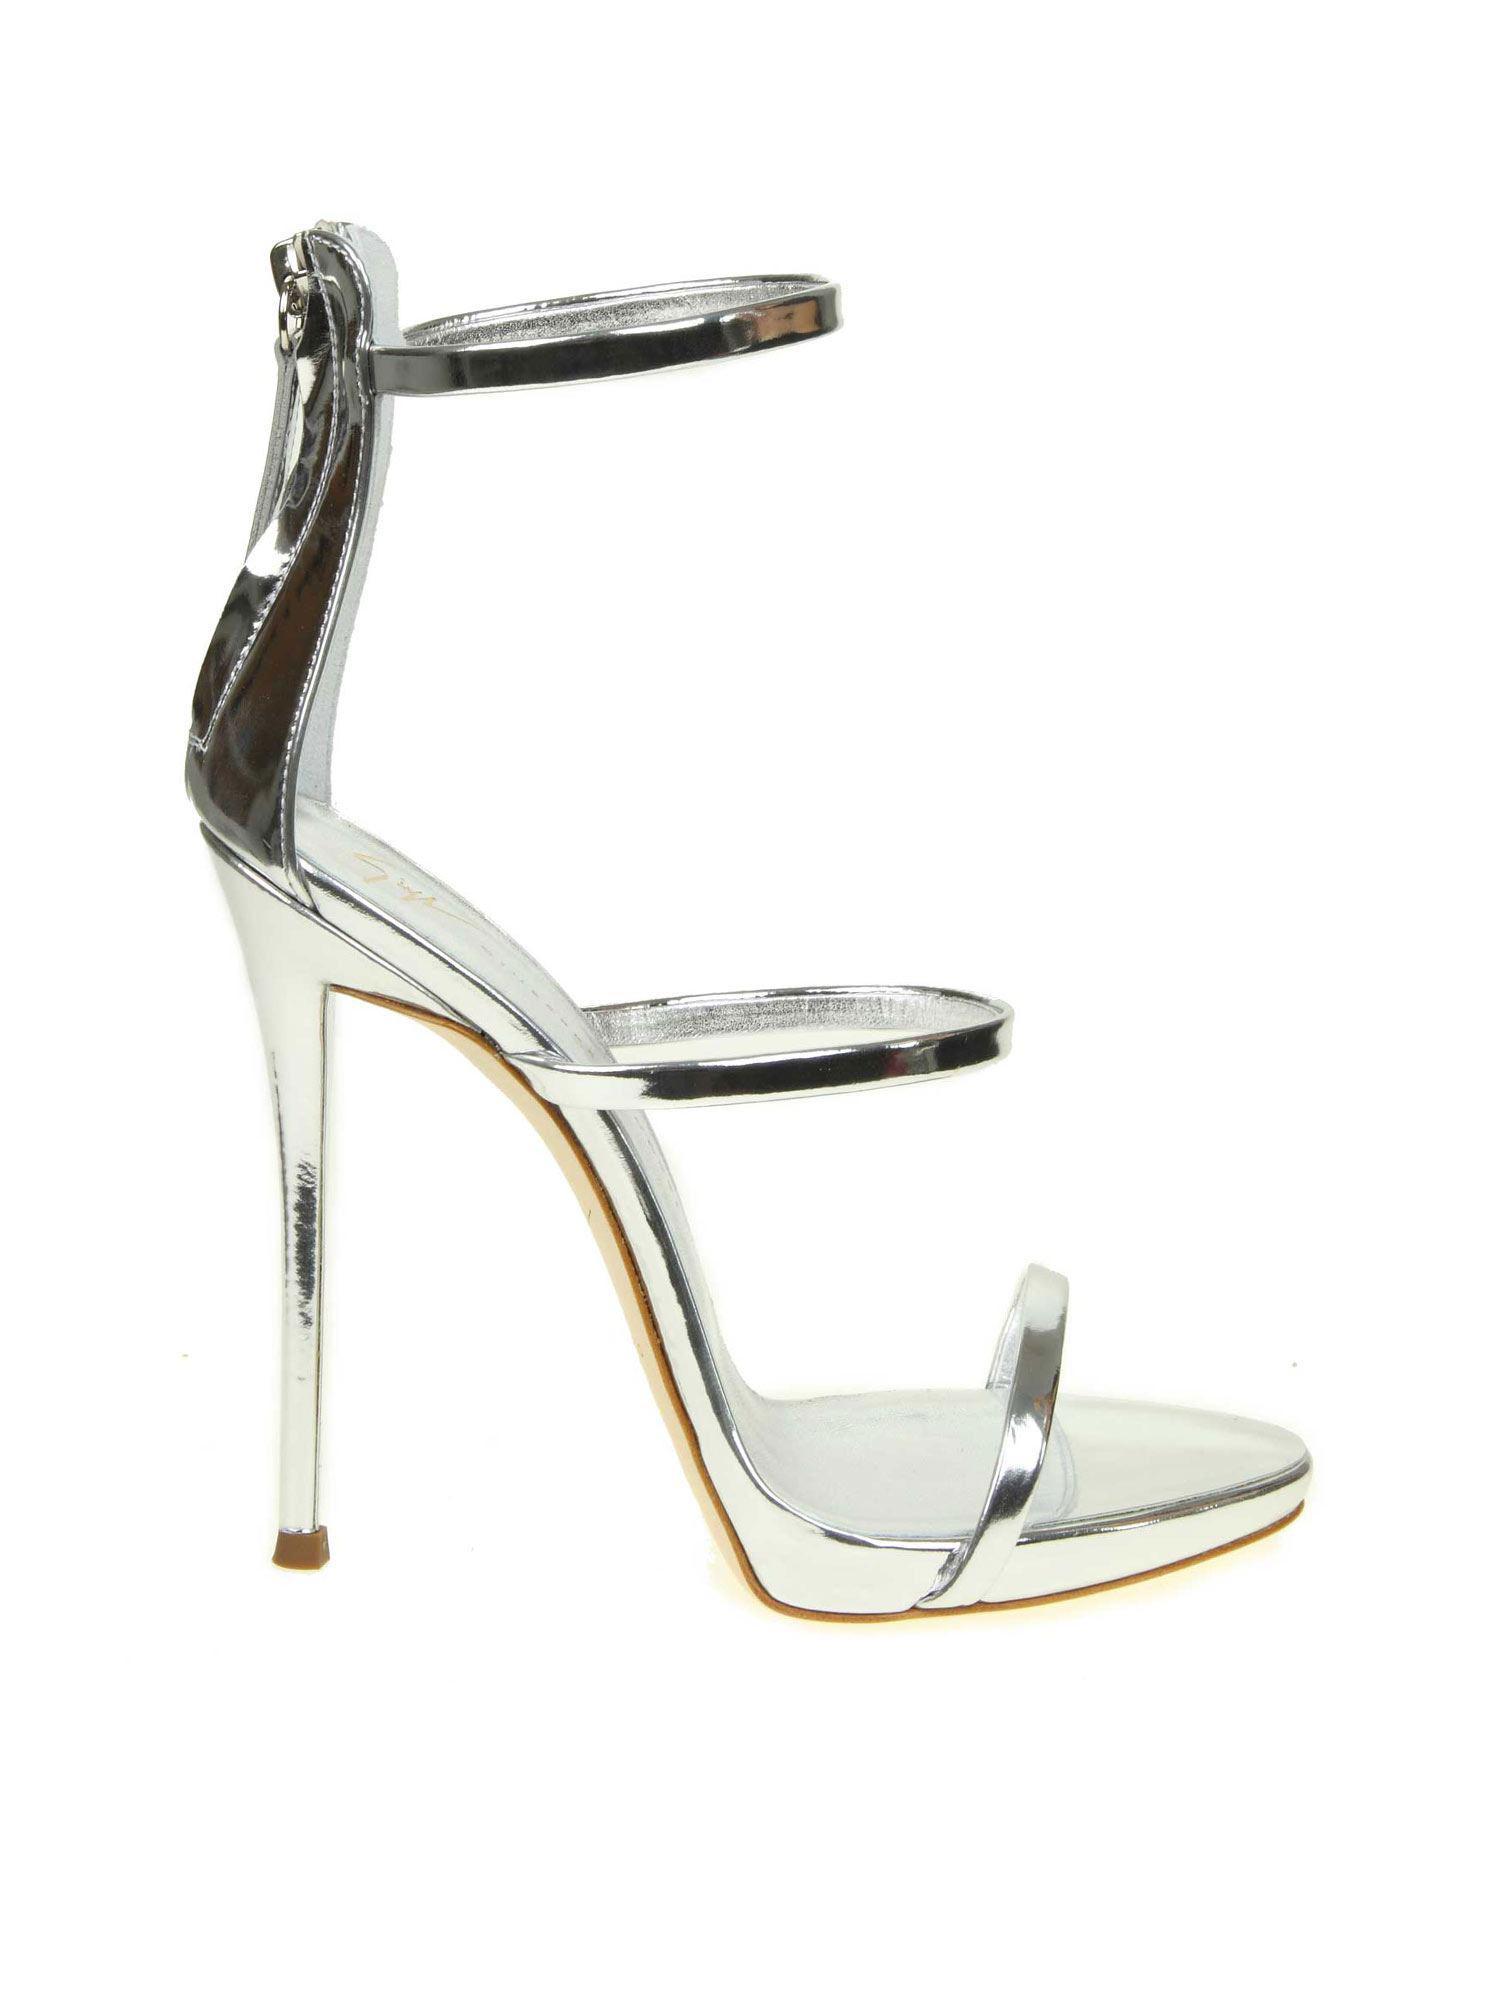 daad6b8f22d Lyst - Giuseppe Zanotti Heeled Sandals Women in Metallic - Save 9%